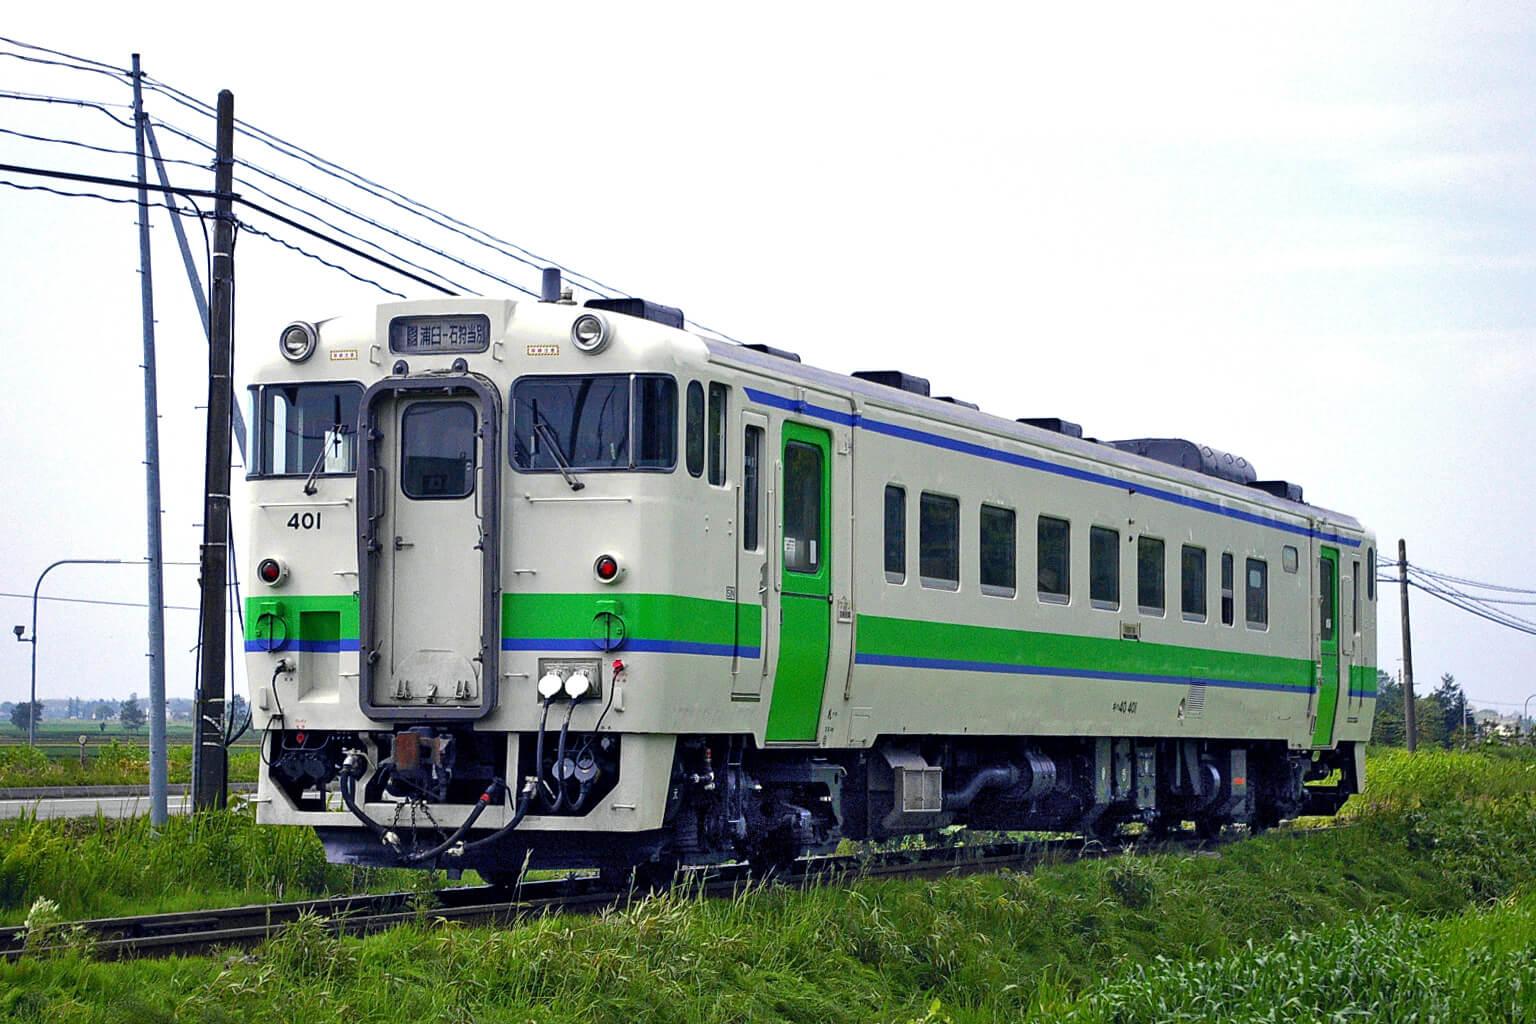 JR Hokkaido KI HA 40 401 - 撮り鉄またも不祥事、今度は札沼線で列車の運行妨害